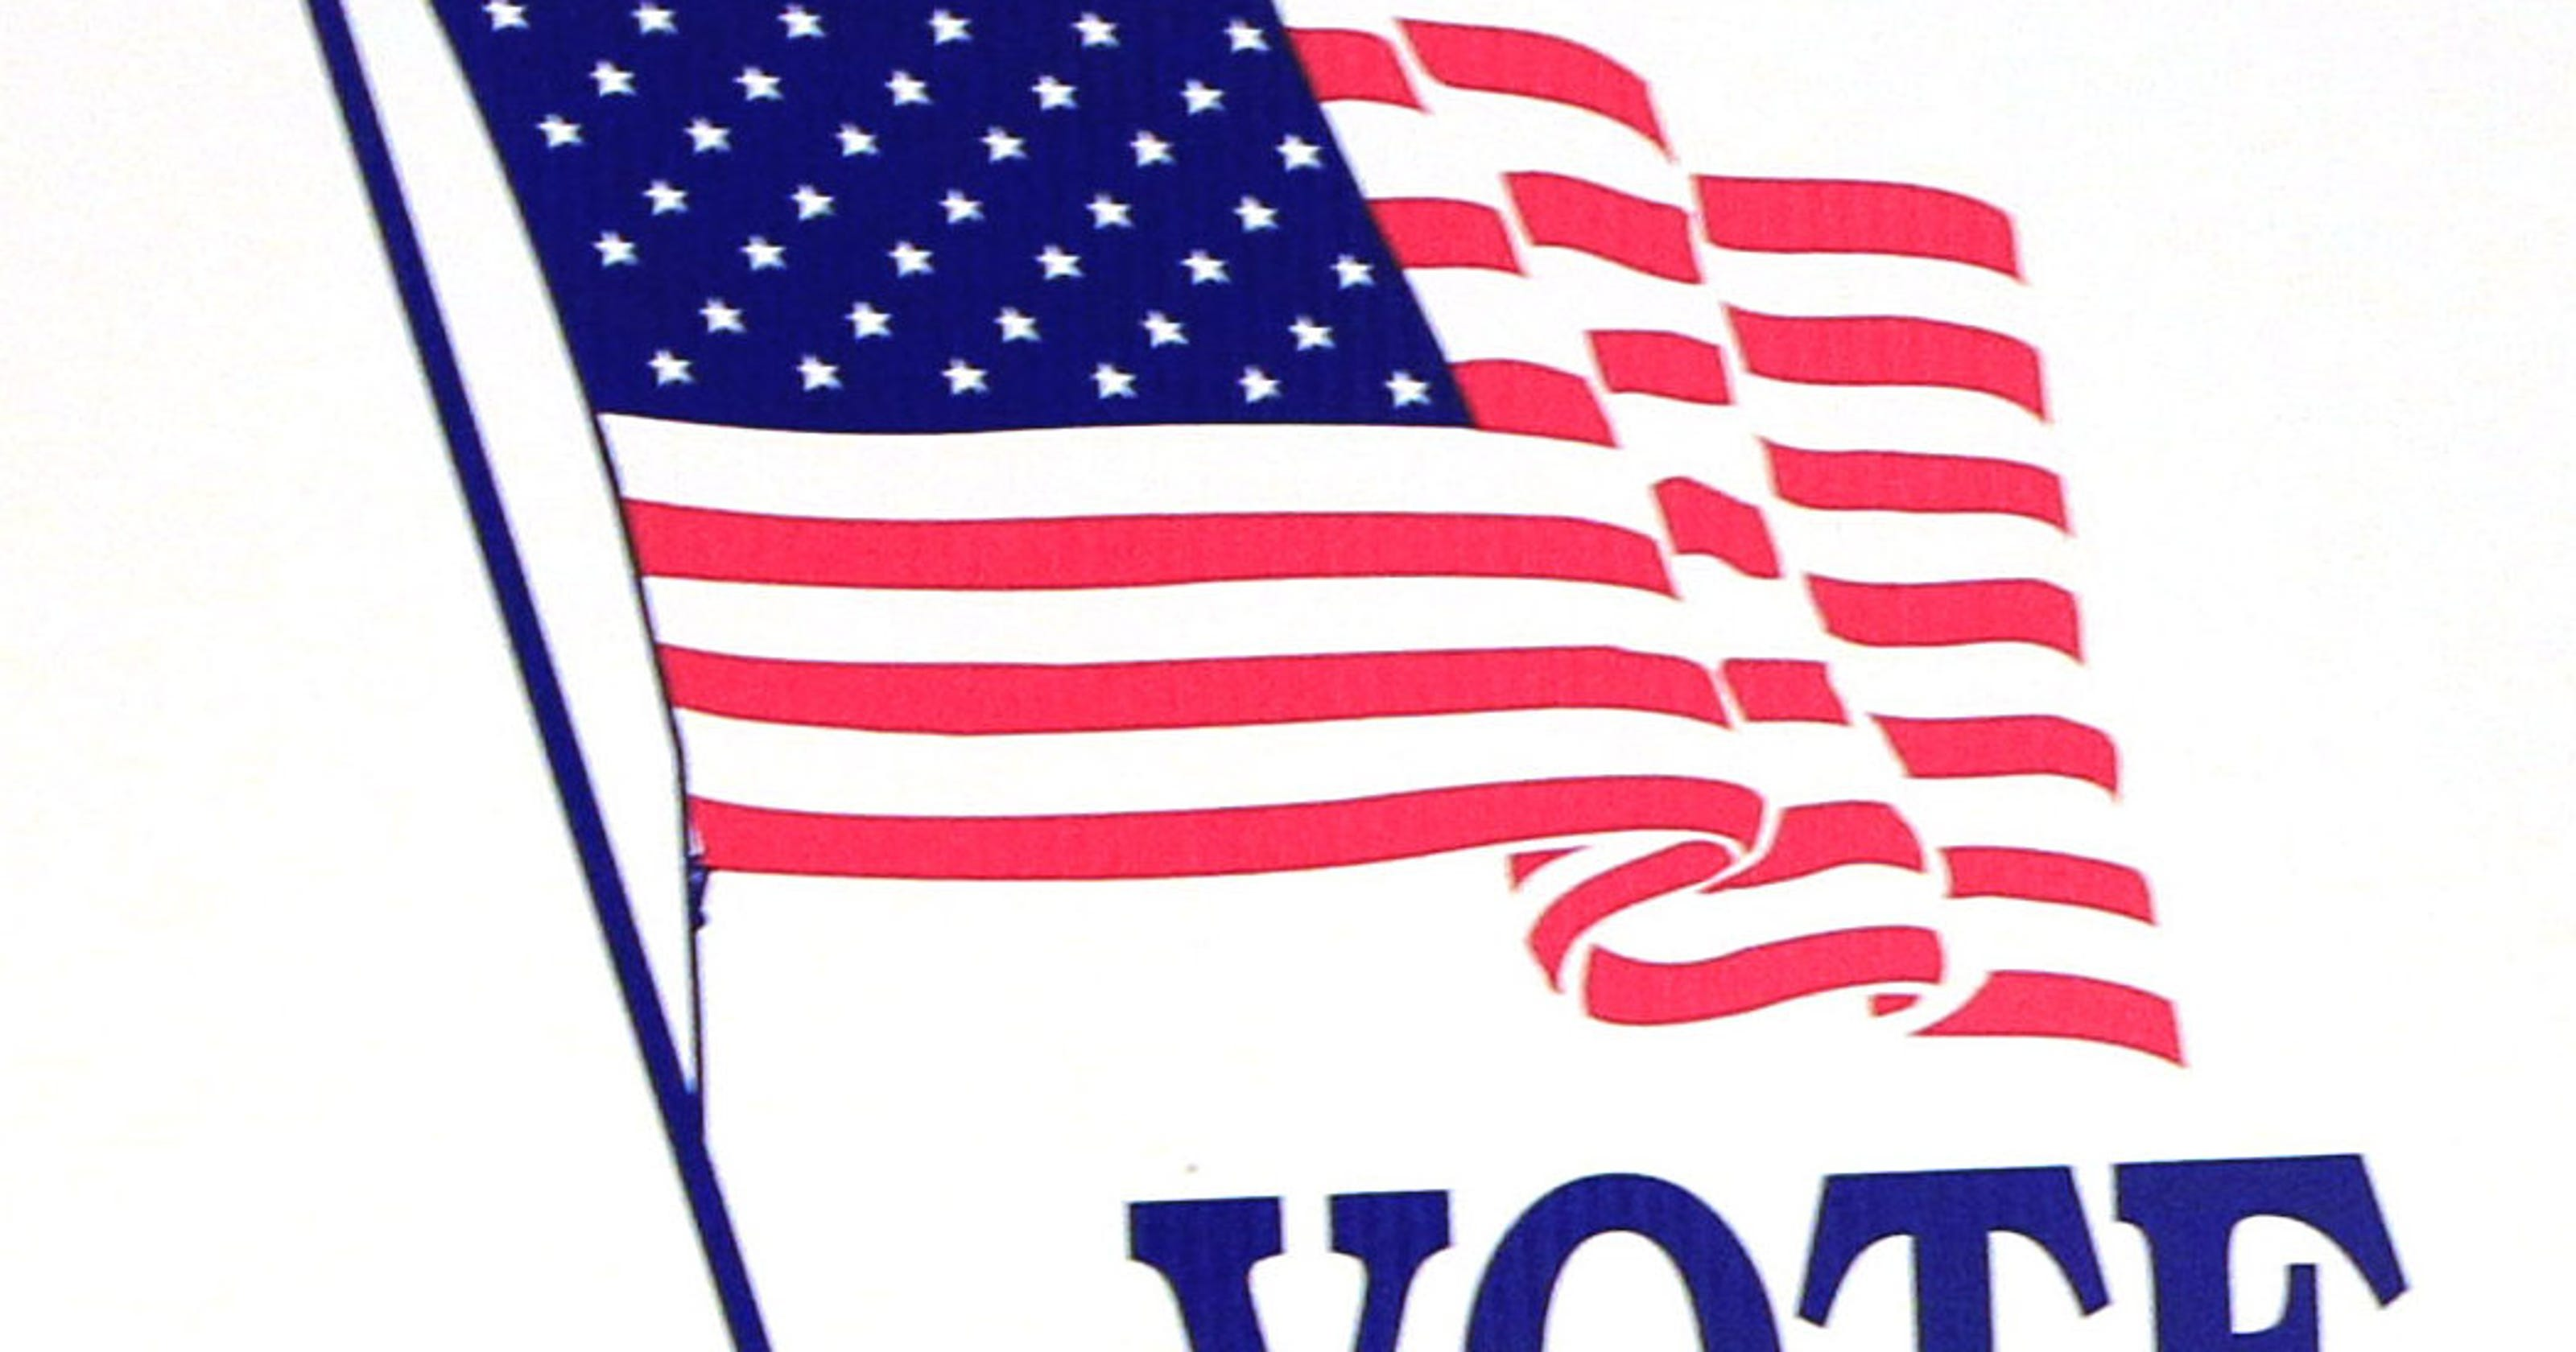 Union County: Free Union County Votes app